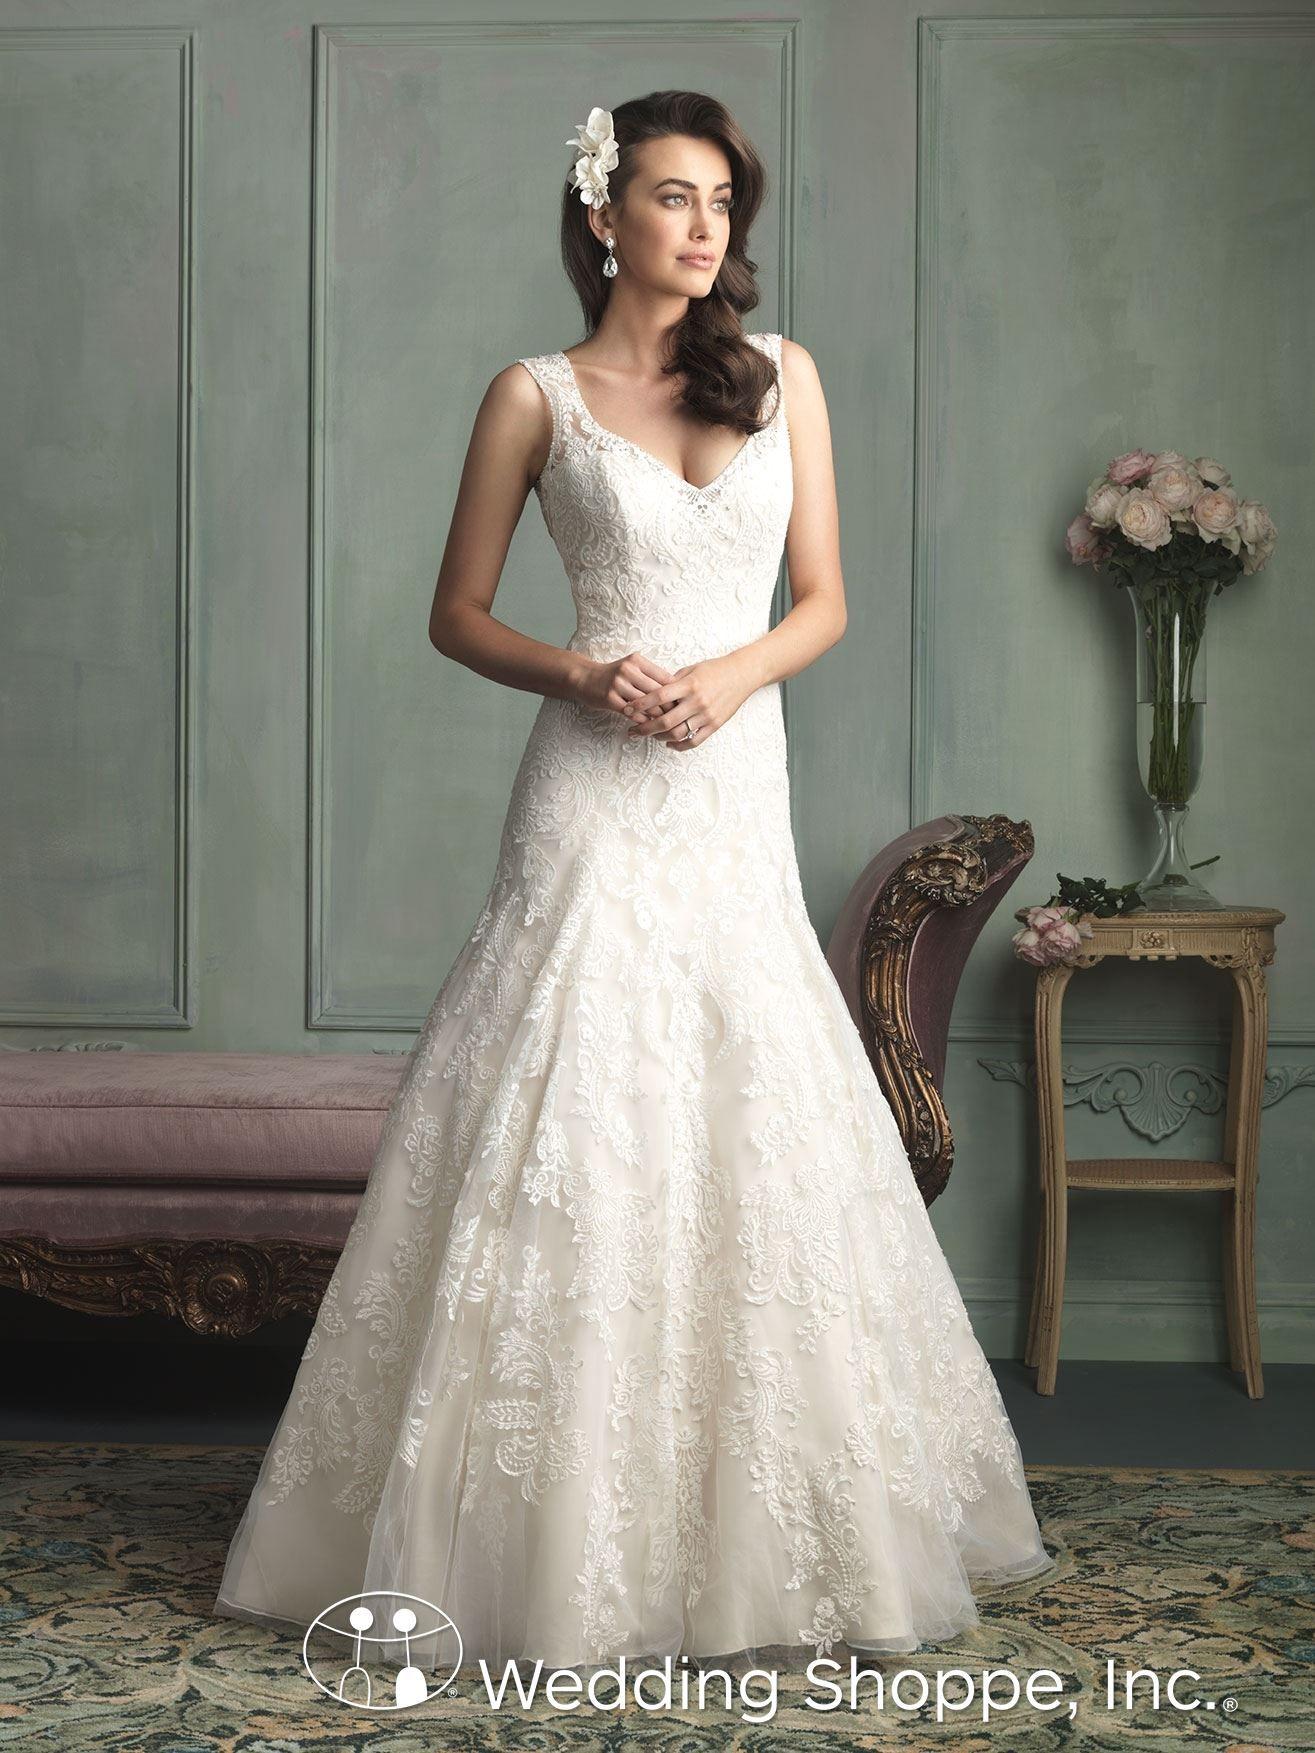 Beautiful Simple Wedding Dress - Women\'s Dresses for Wedding Guest ...